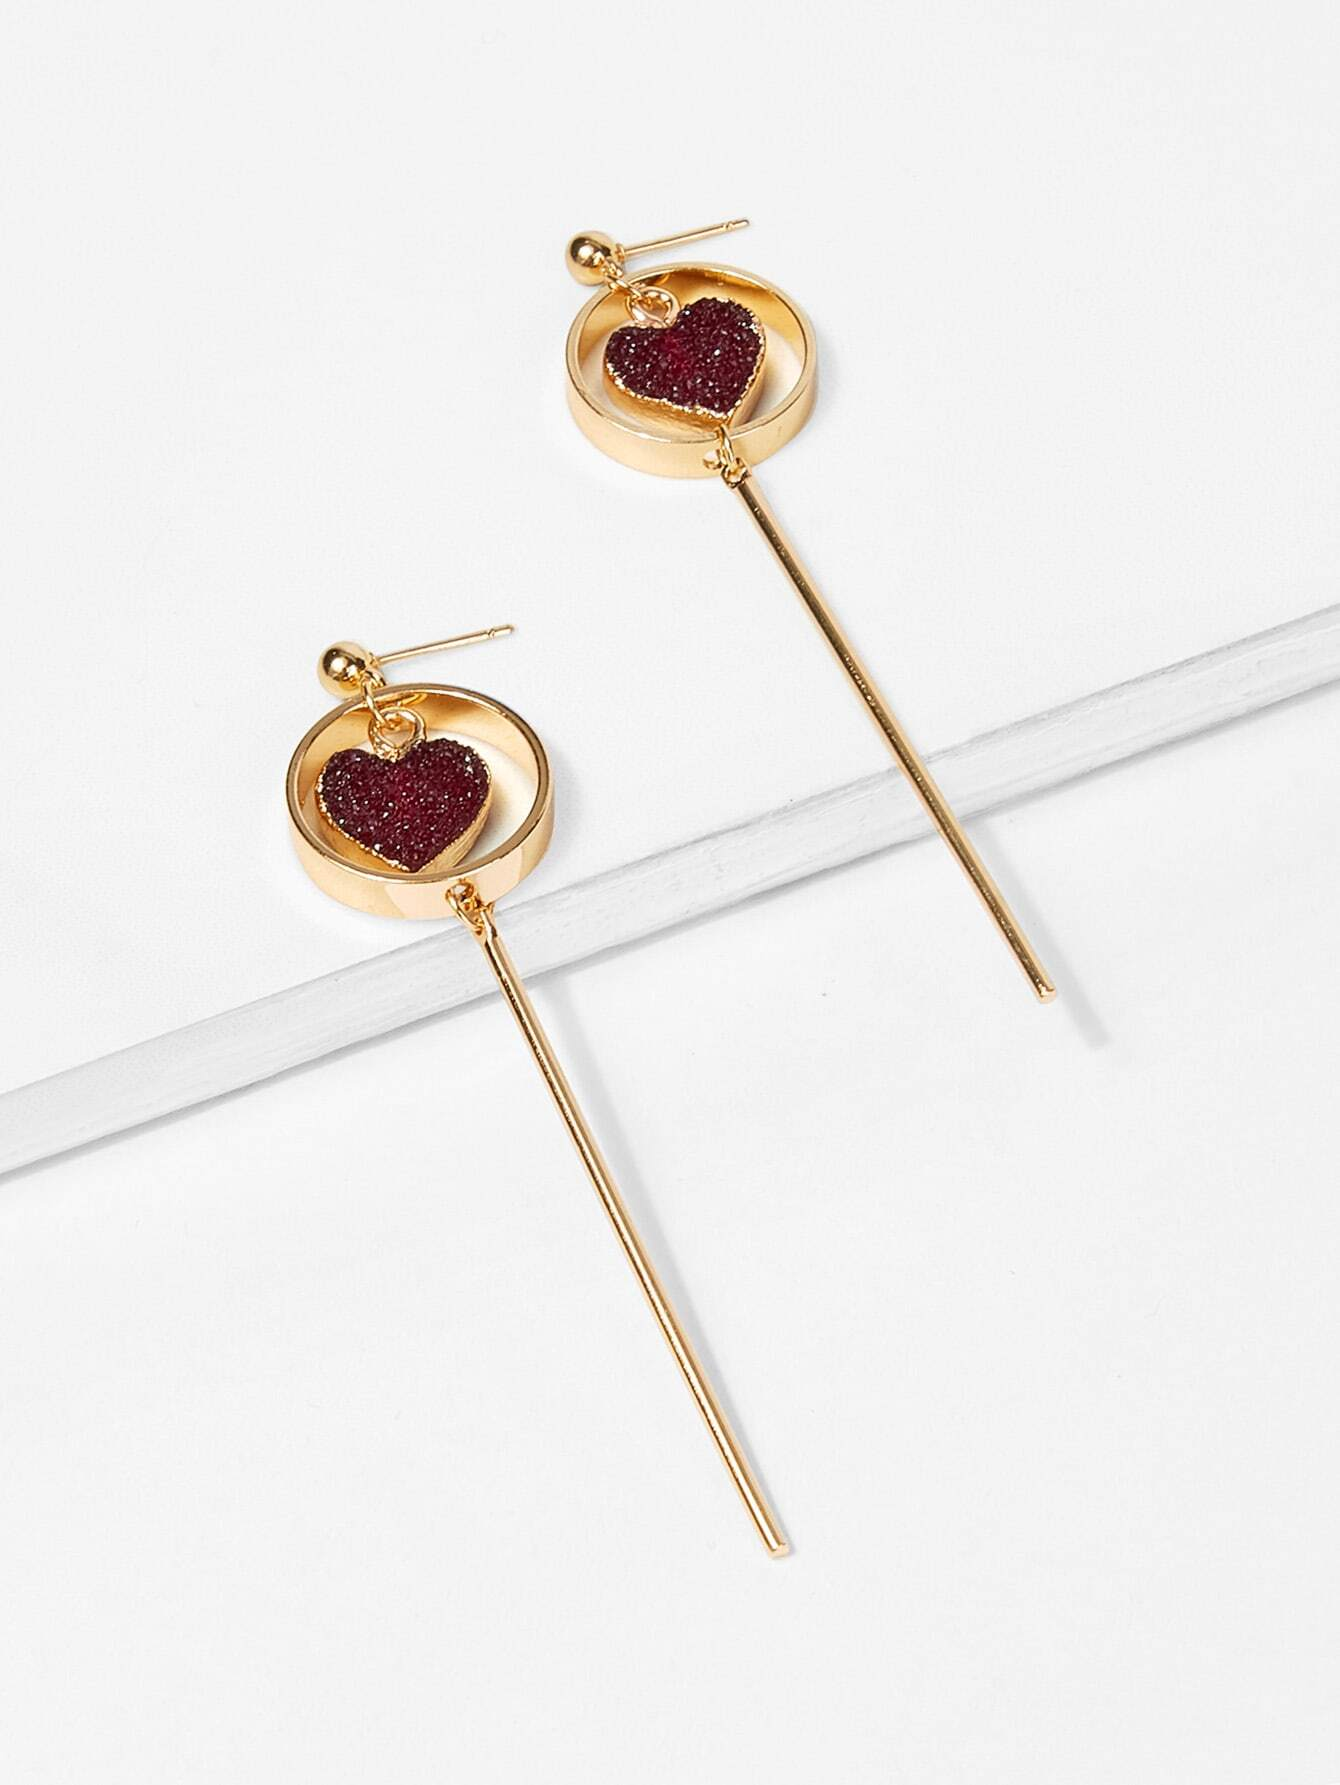 Heart & Bar Detail Hoop Drop Earrings silver plated bar dangle drop earrings